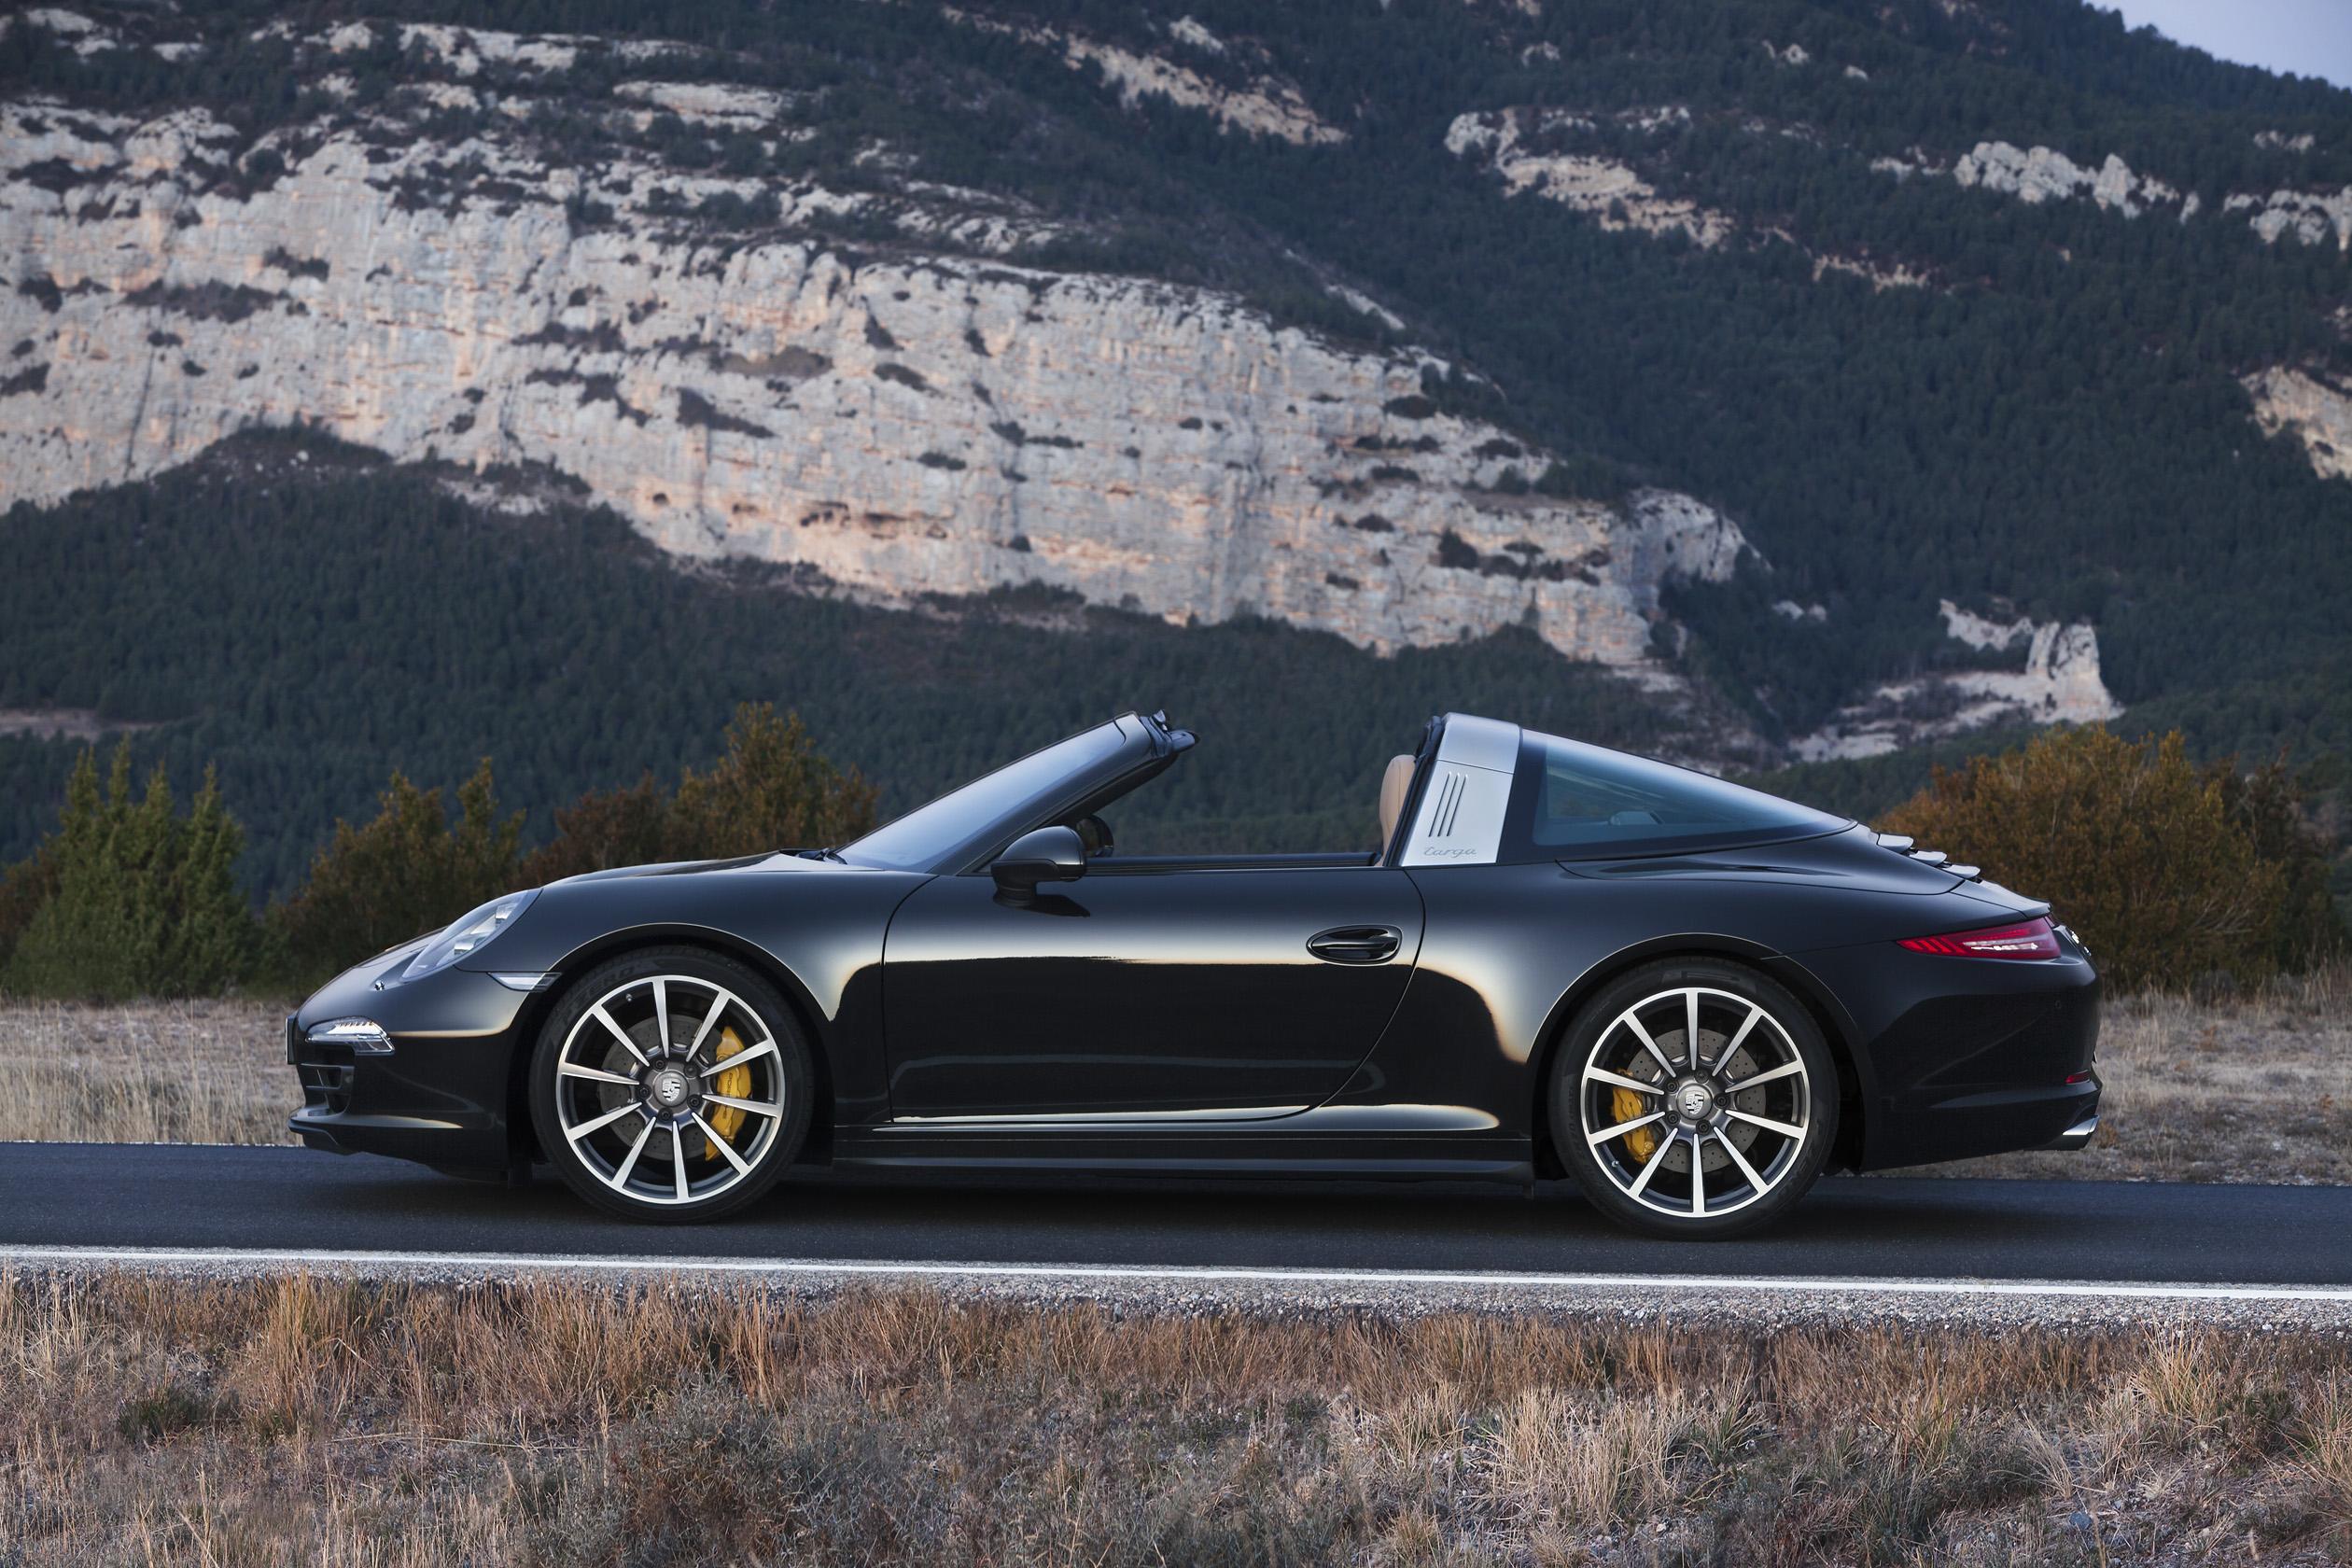 New Porsche 911 Targa 2014 Bhp Cars Performance